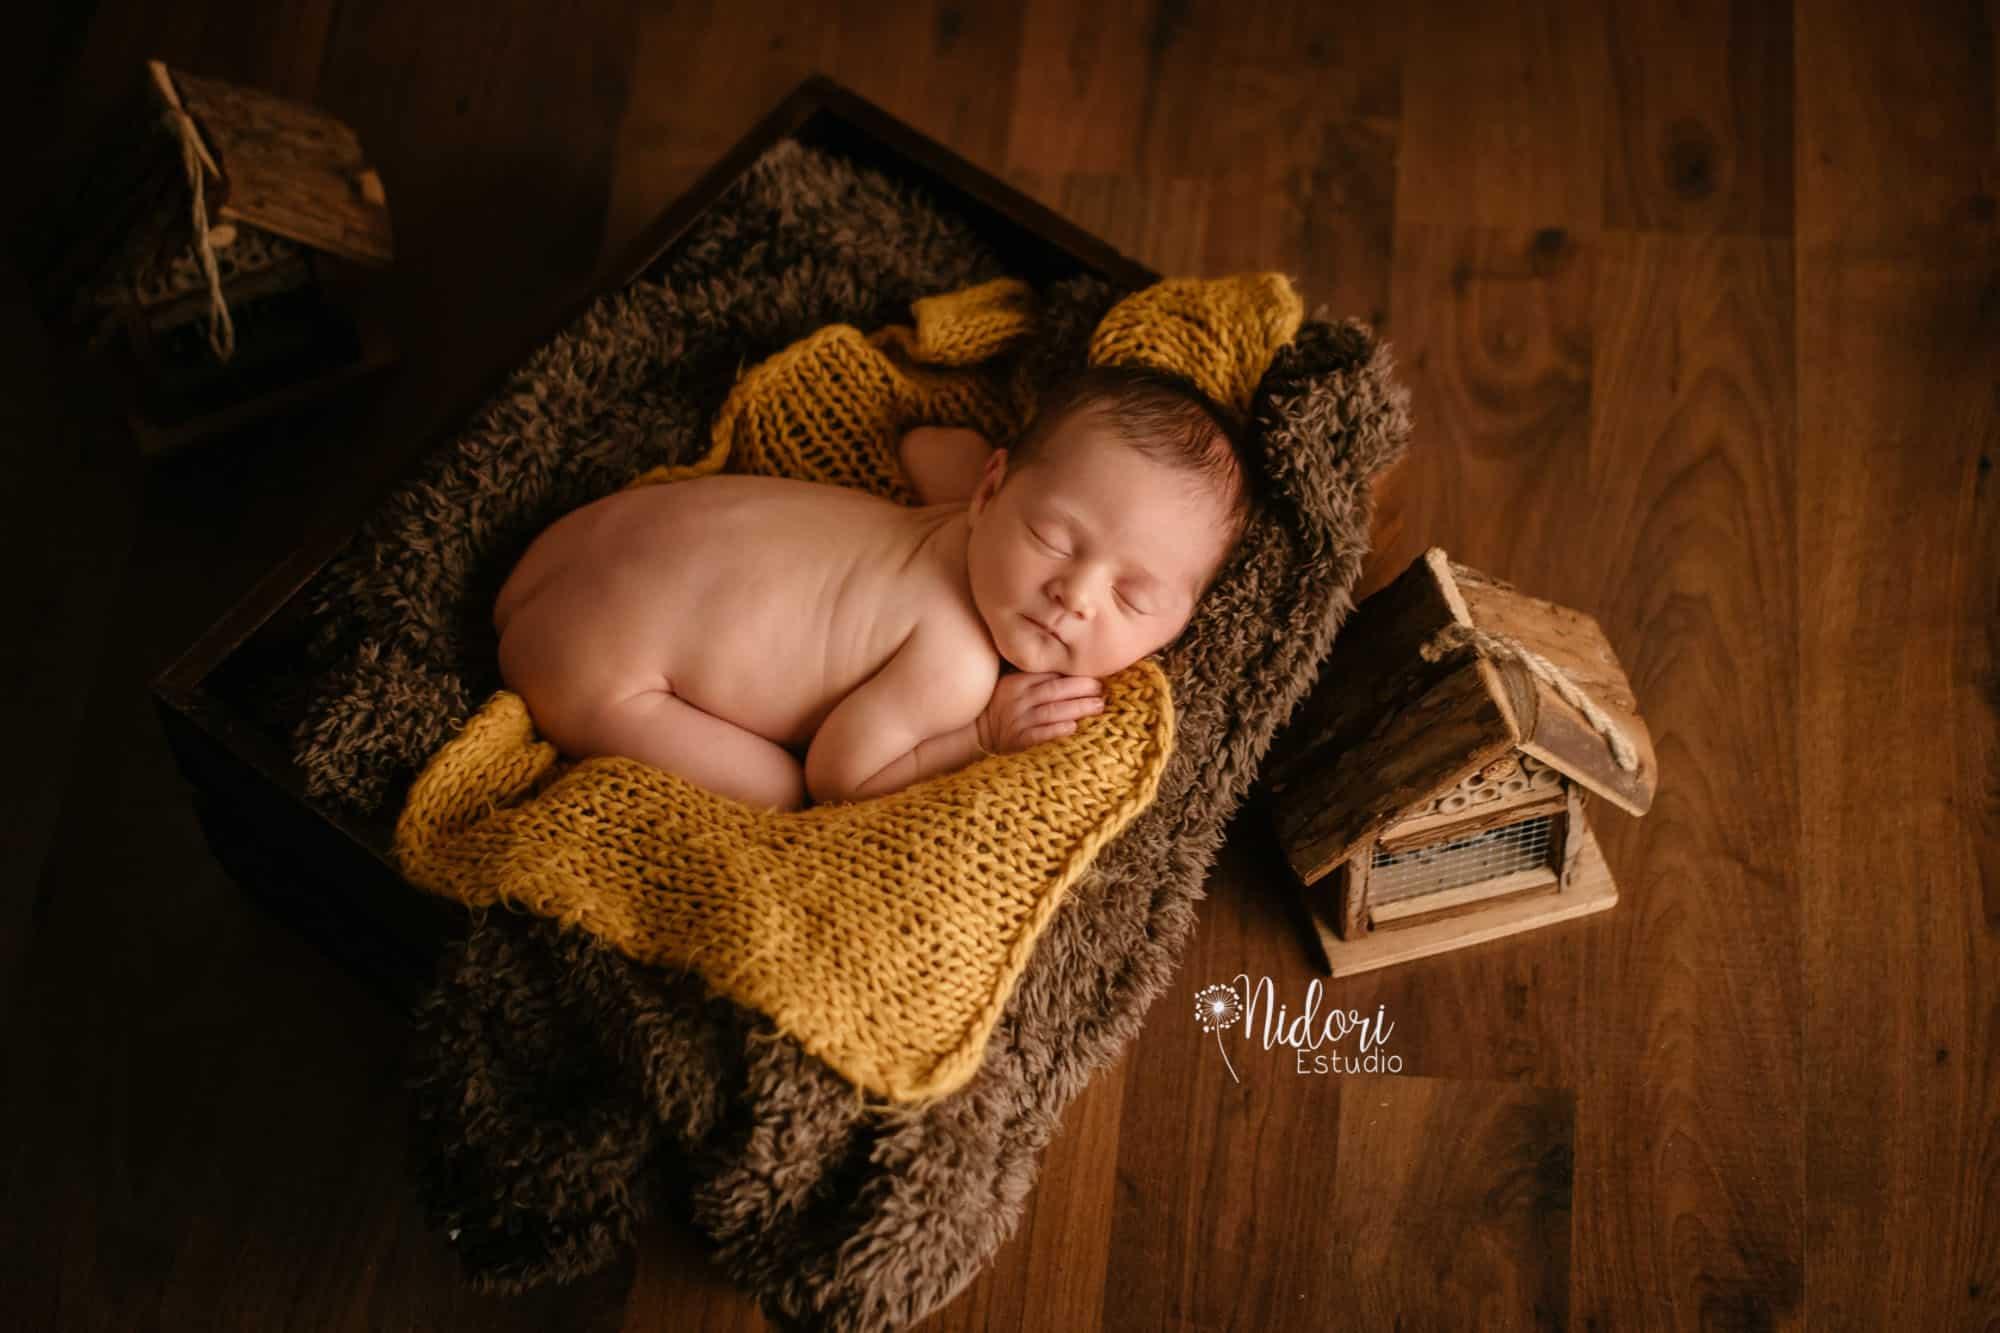 fotosbebe-fotografia-recien-nacido-newborn-bebes-nidoriestudio-fotos-valencia-almazora-castellon-españa-spain-12